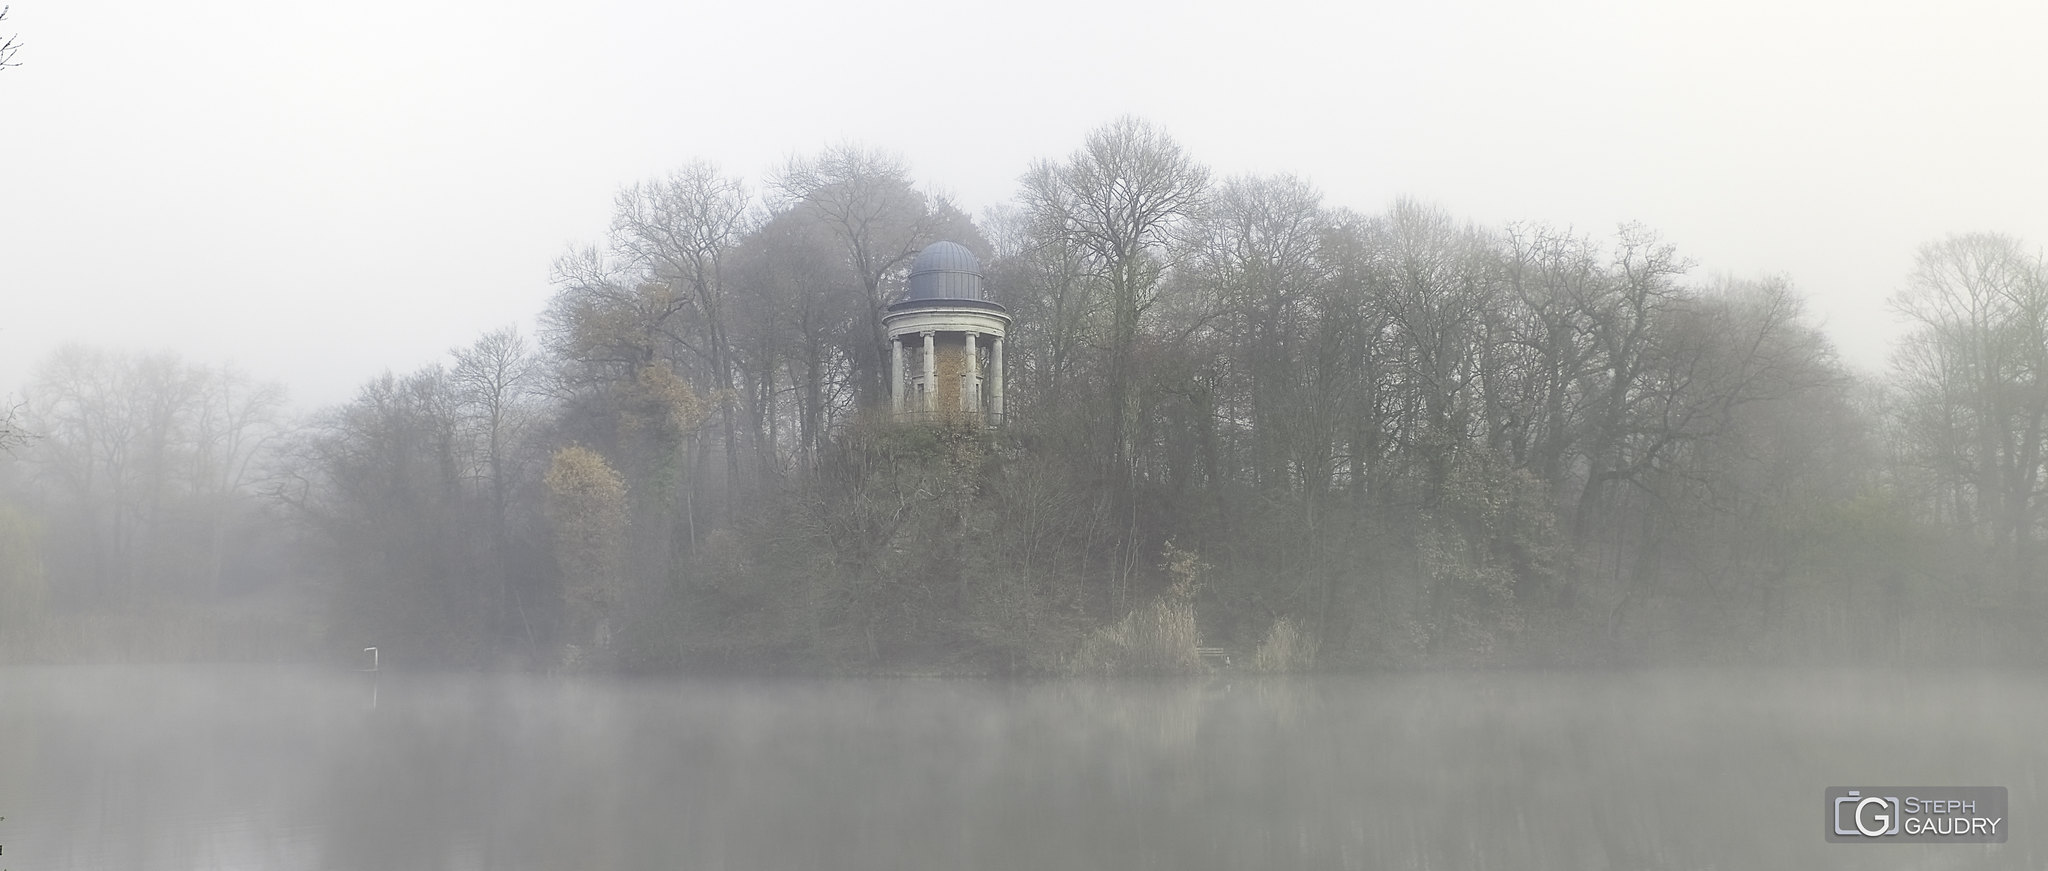 Wégimont dans le brouillard (11/2019) [Klik om de diavoorstelling te starten]